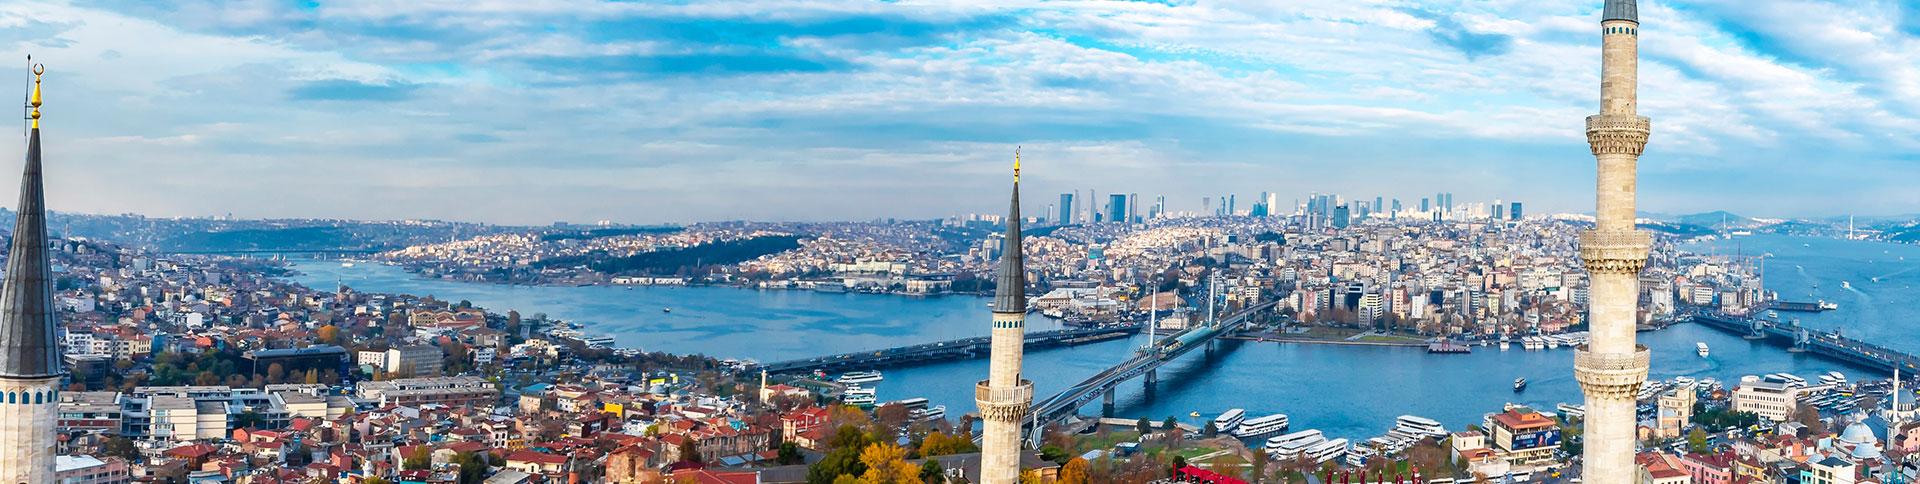 Istanbul Real Estate - Property Turkey - Turkish Citizenship | MELARES